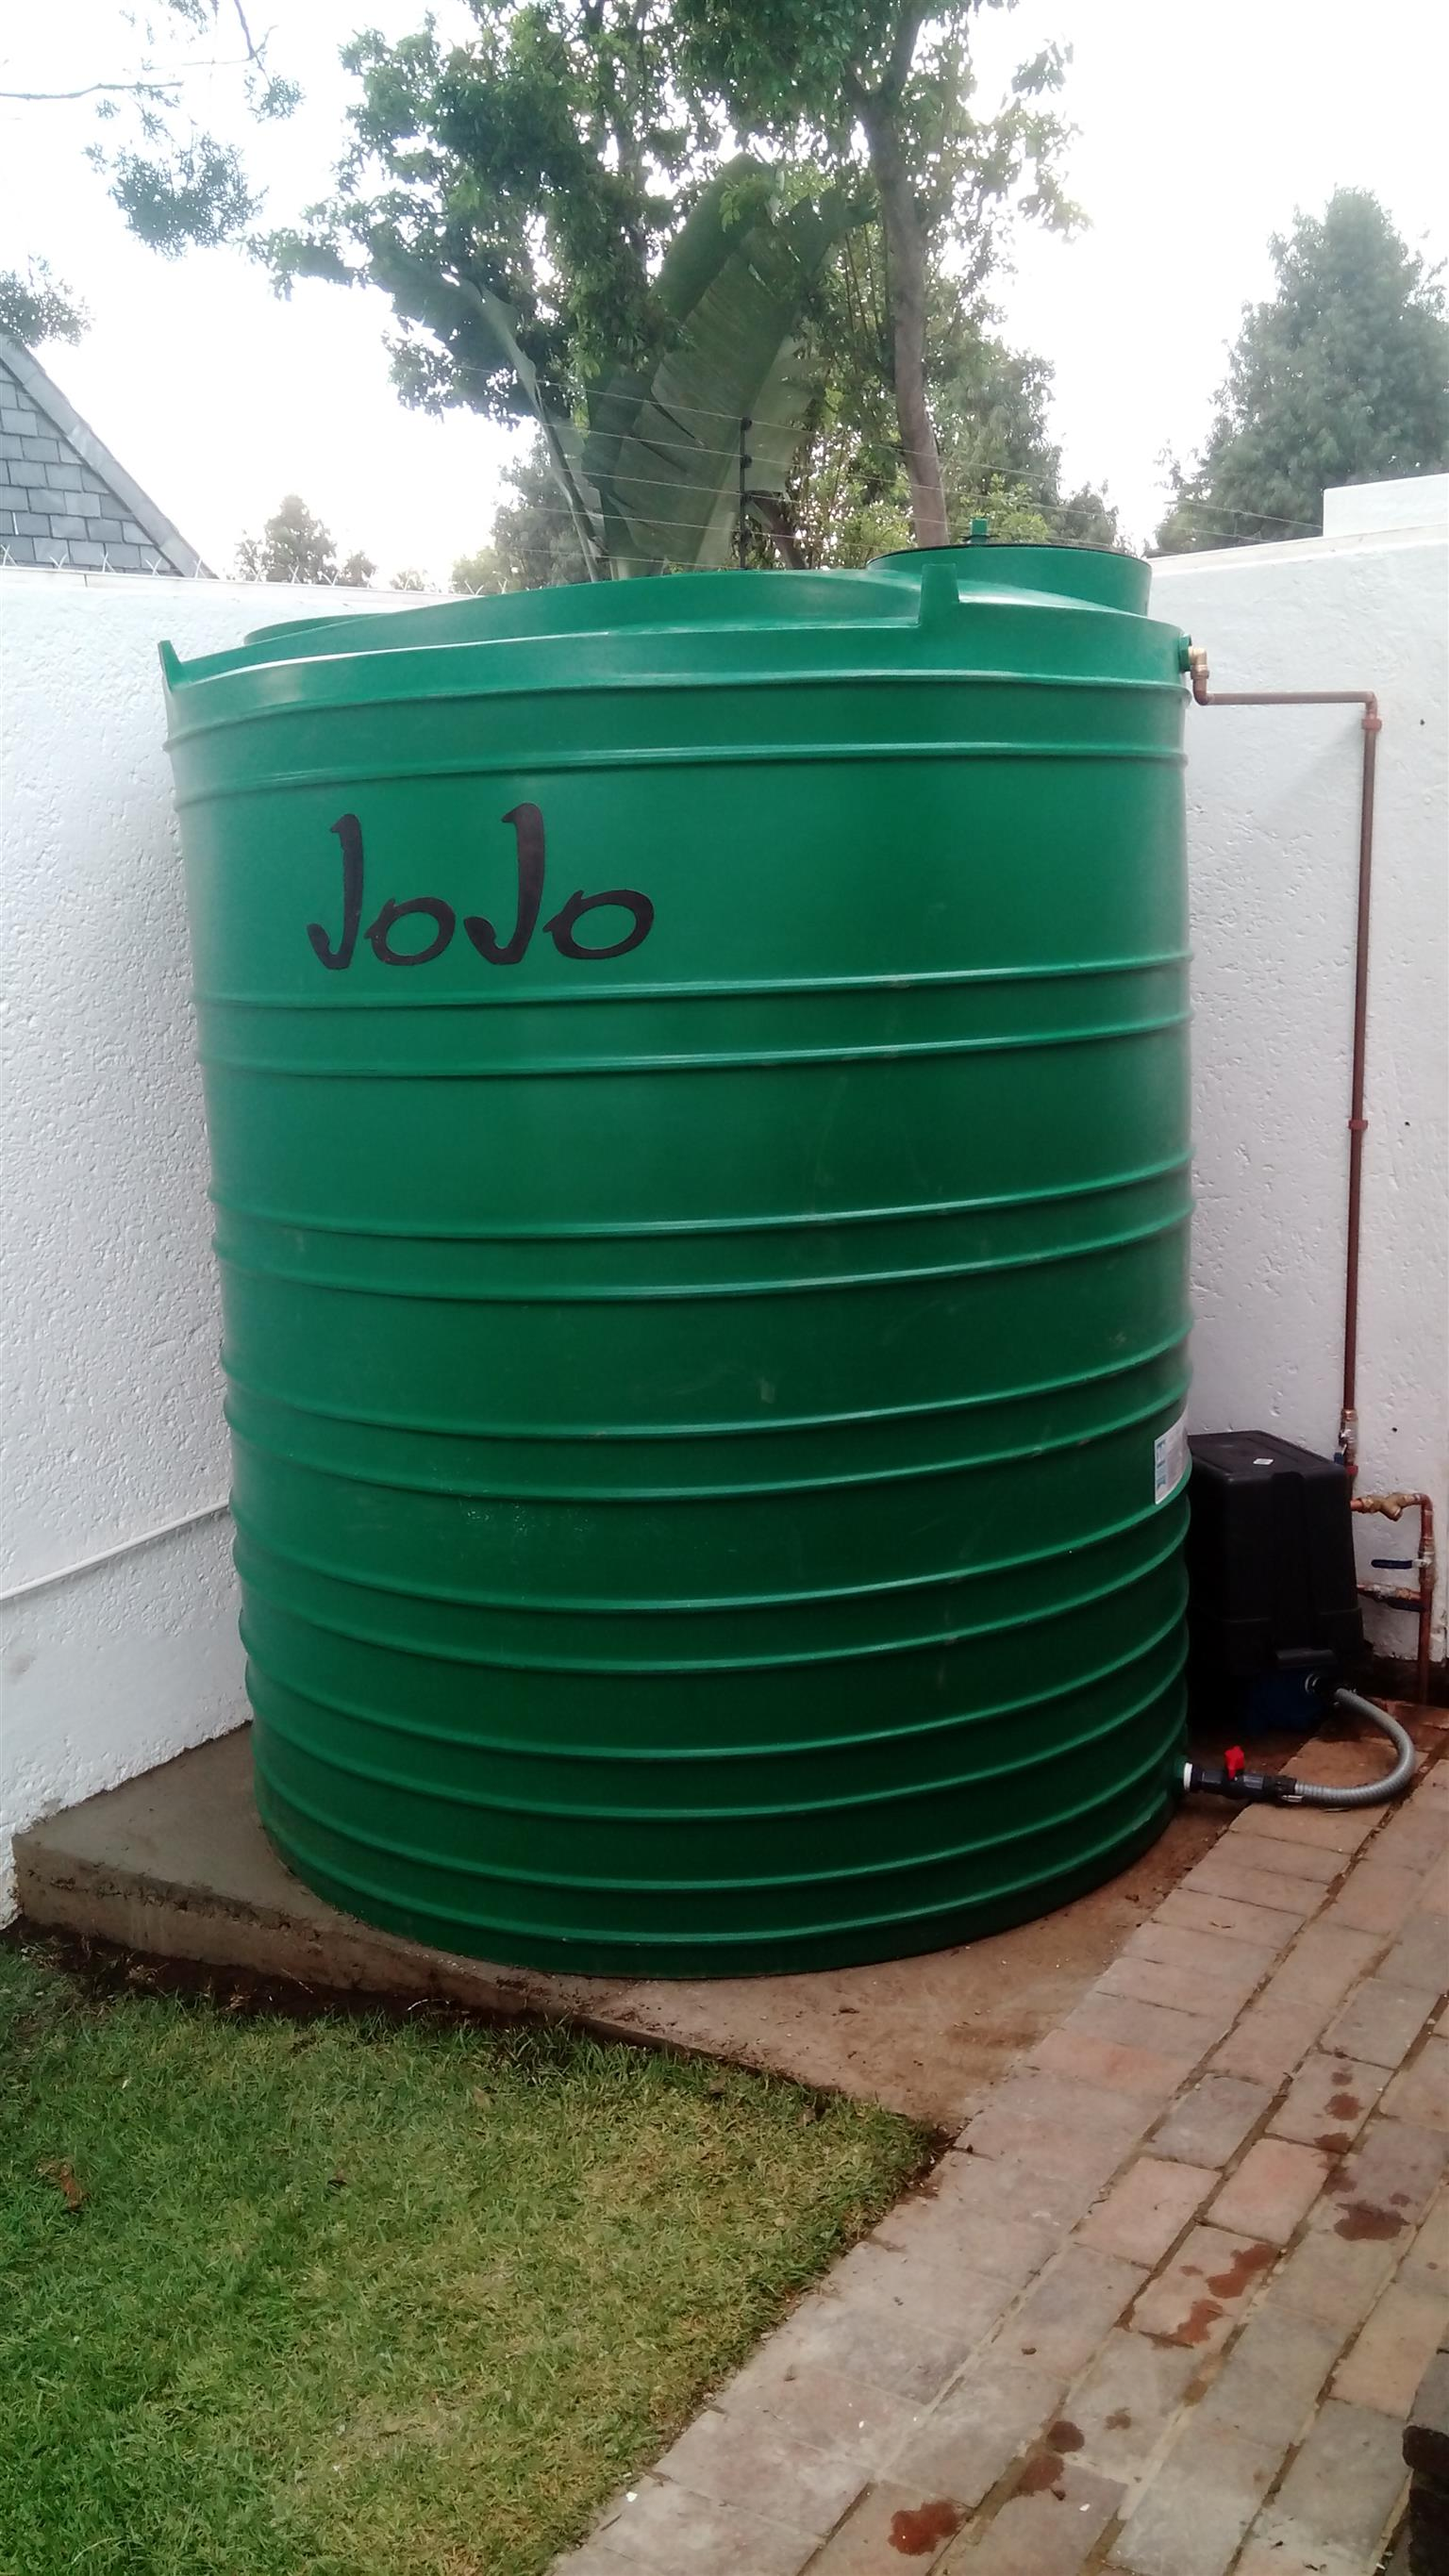 JoJo Tanks for water security